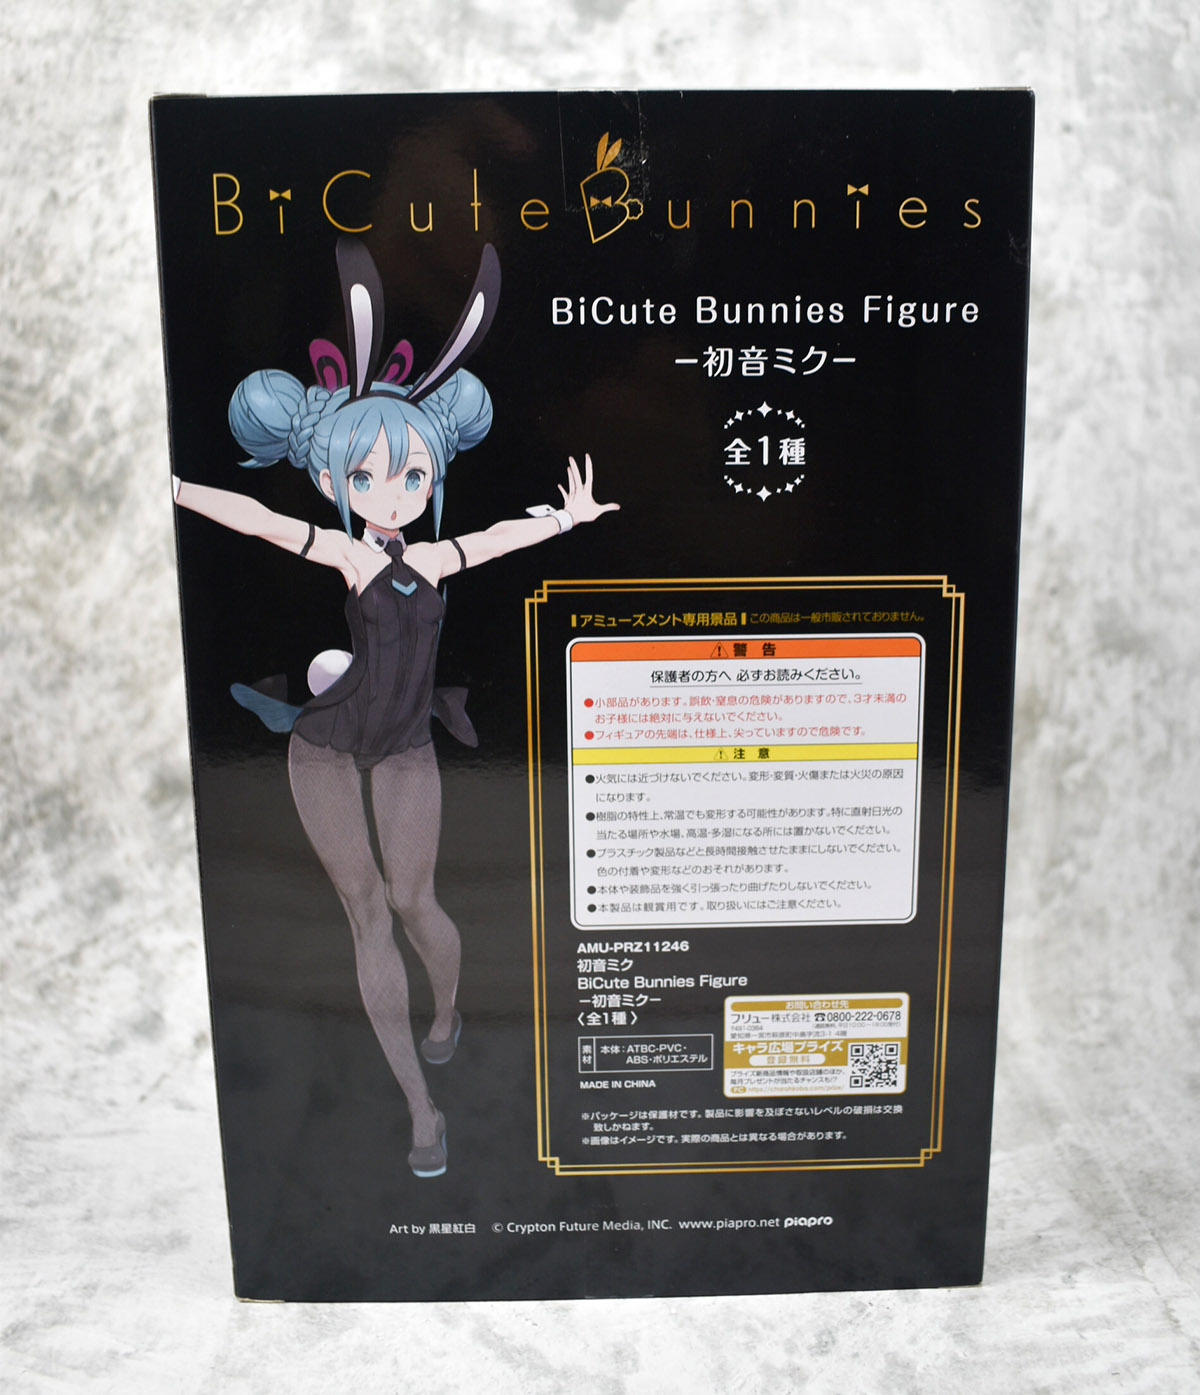 BiCute Bunnies Figure-初音ミク- 黒星紅白 フィギュアレビュー 箱裏面